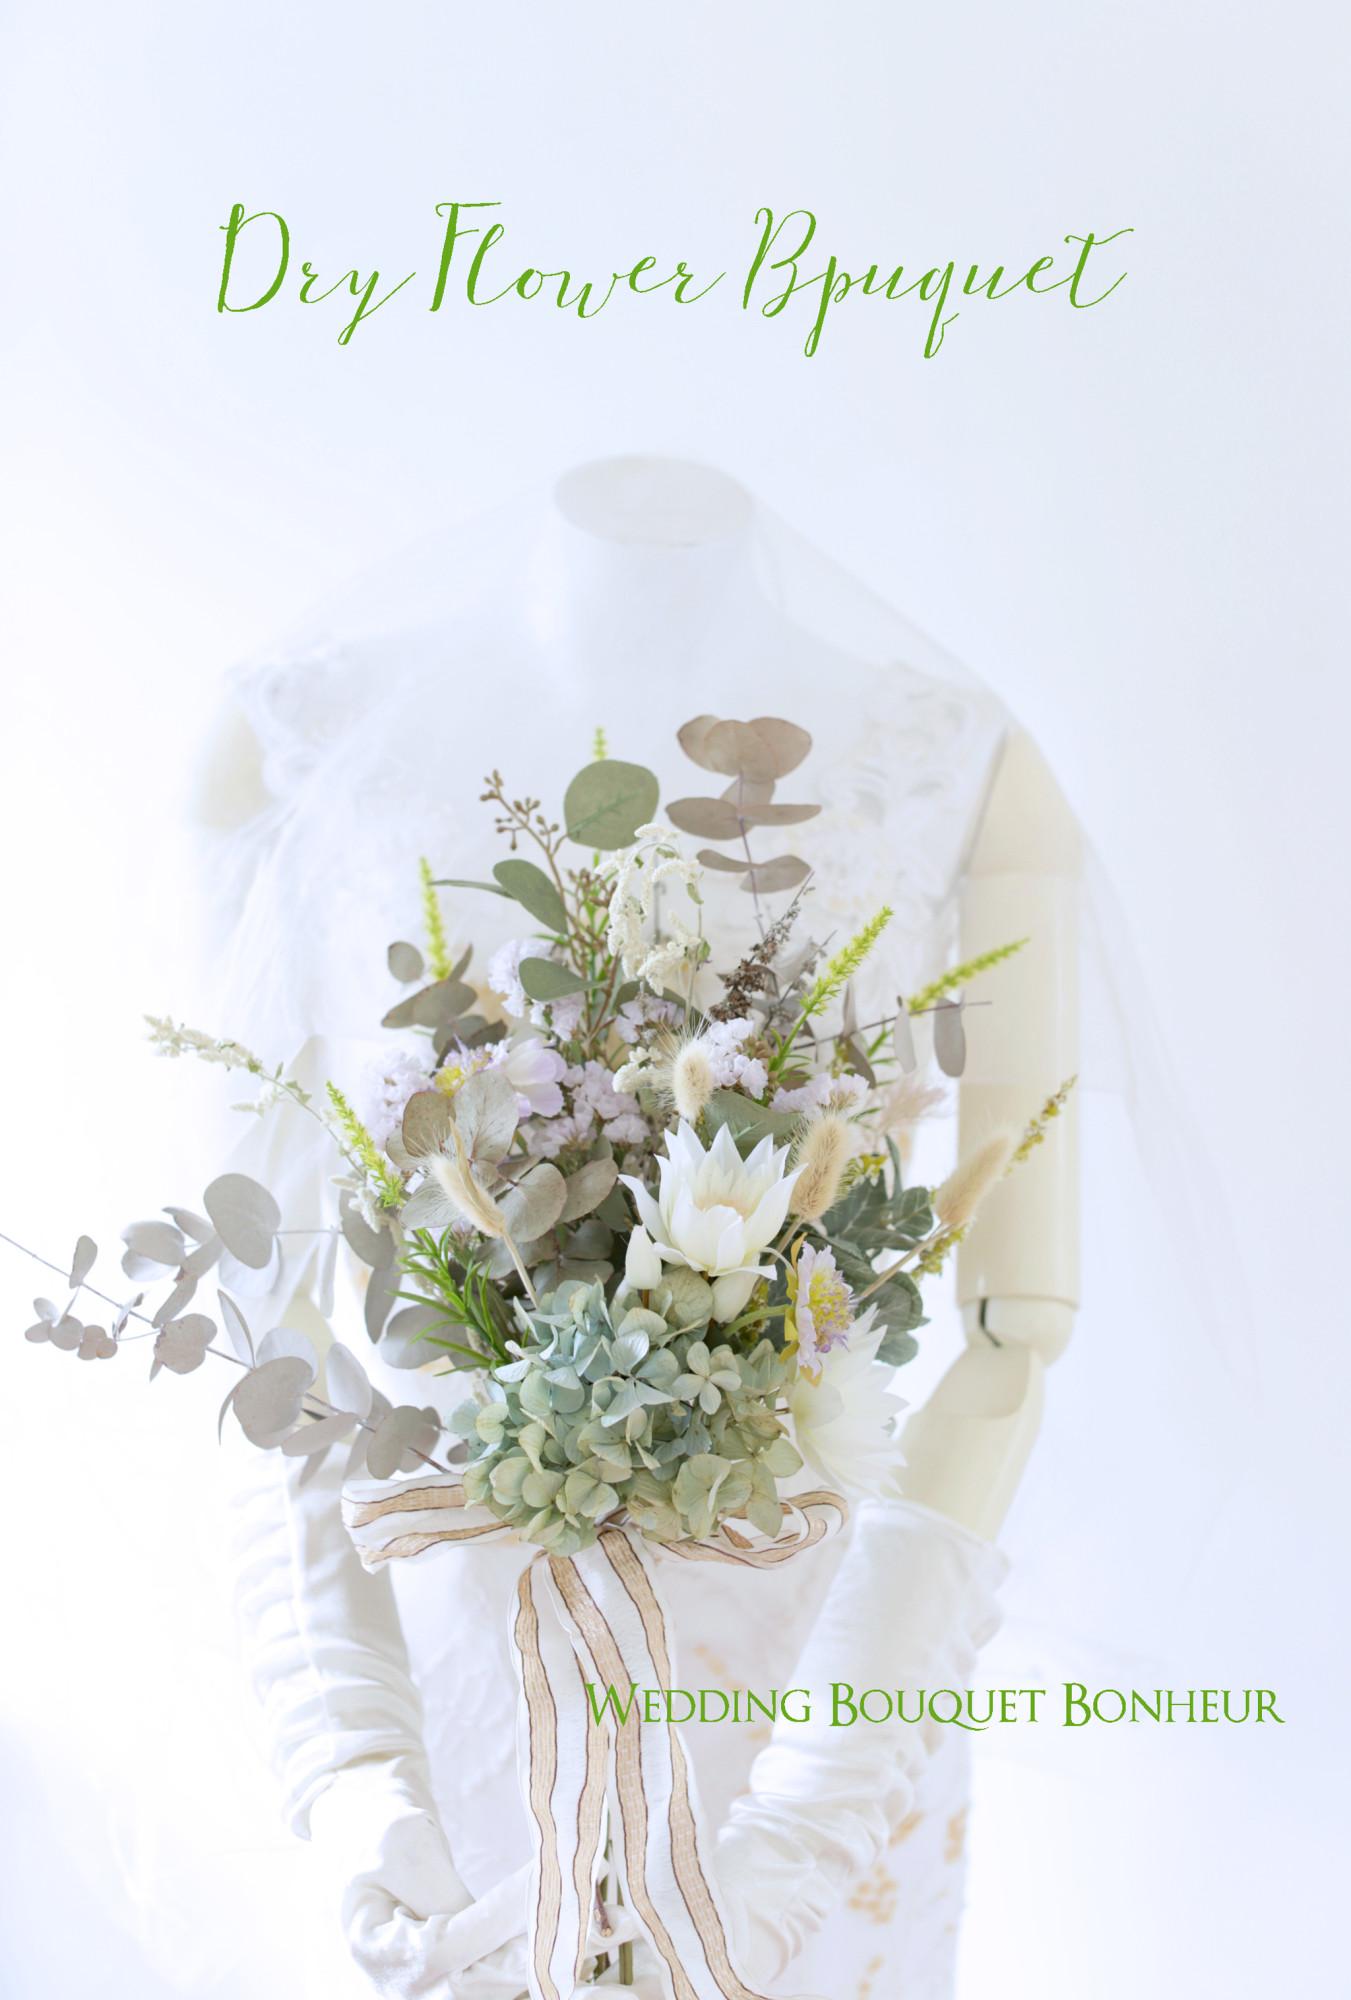 b_bouquet20180524_1